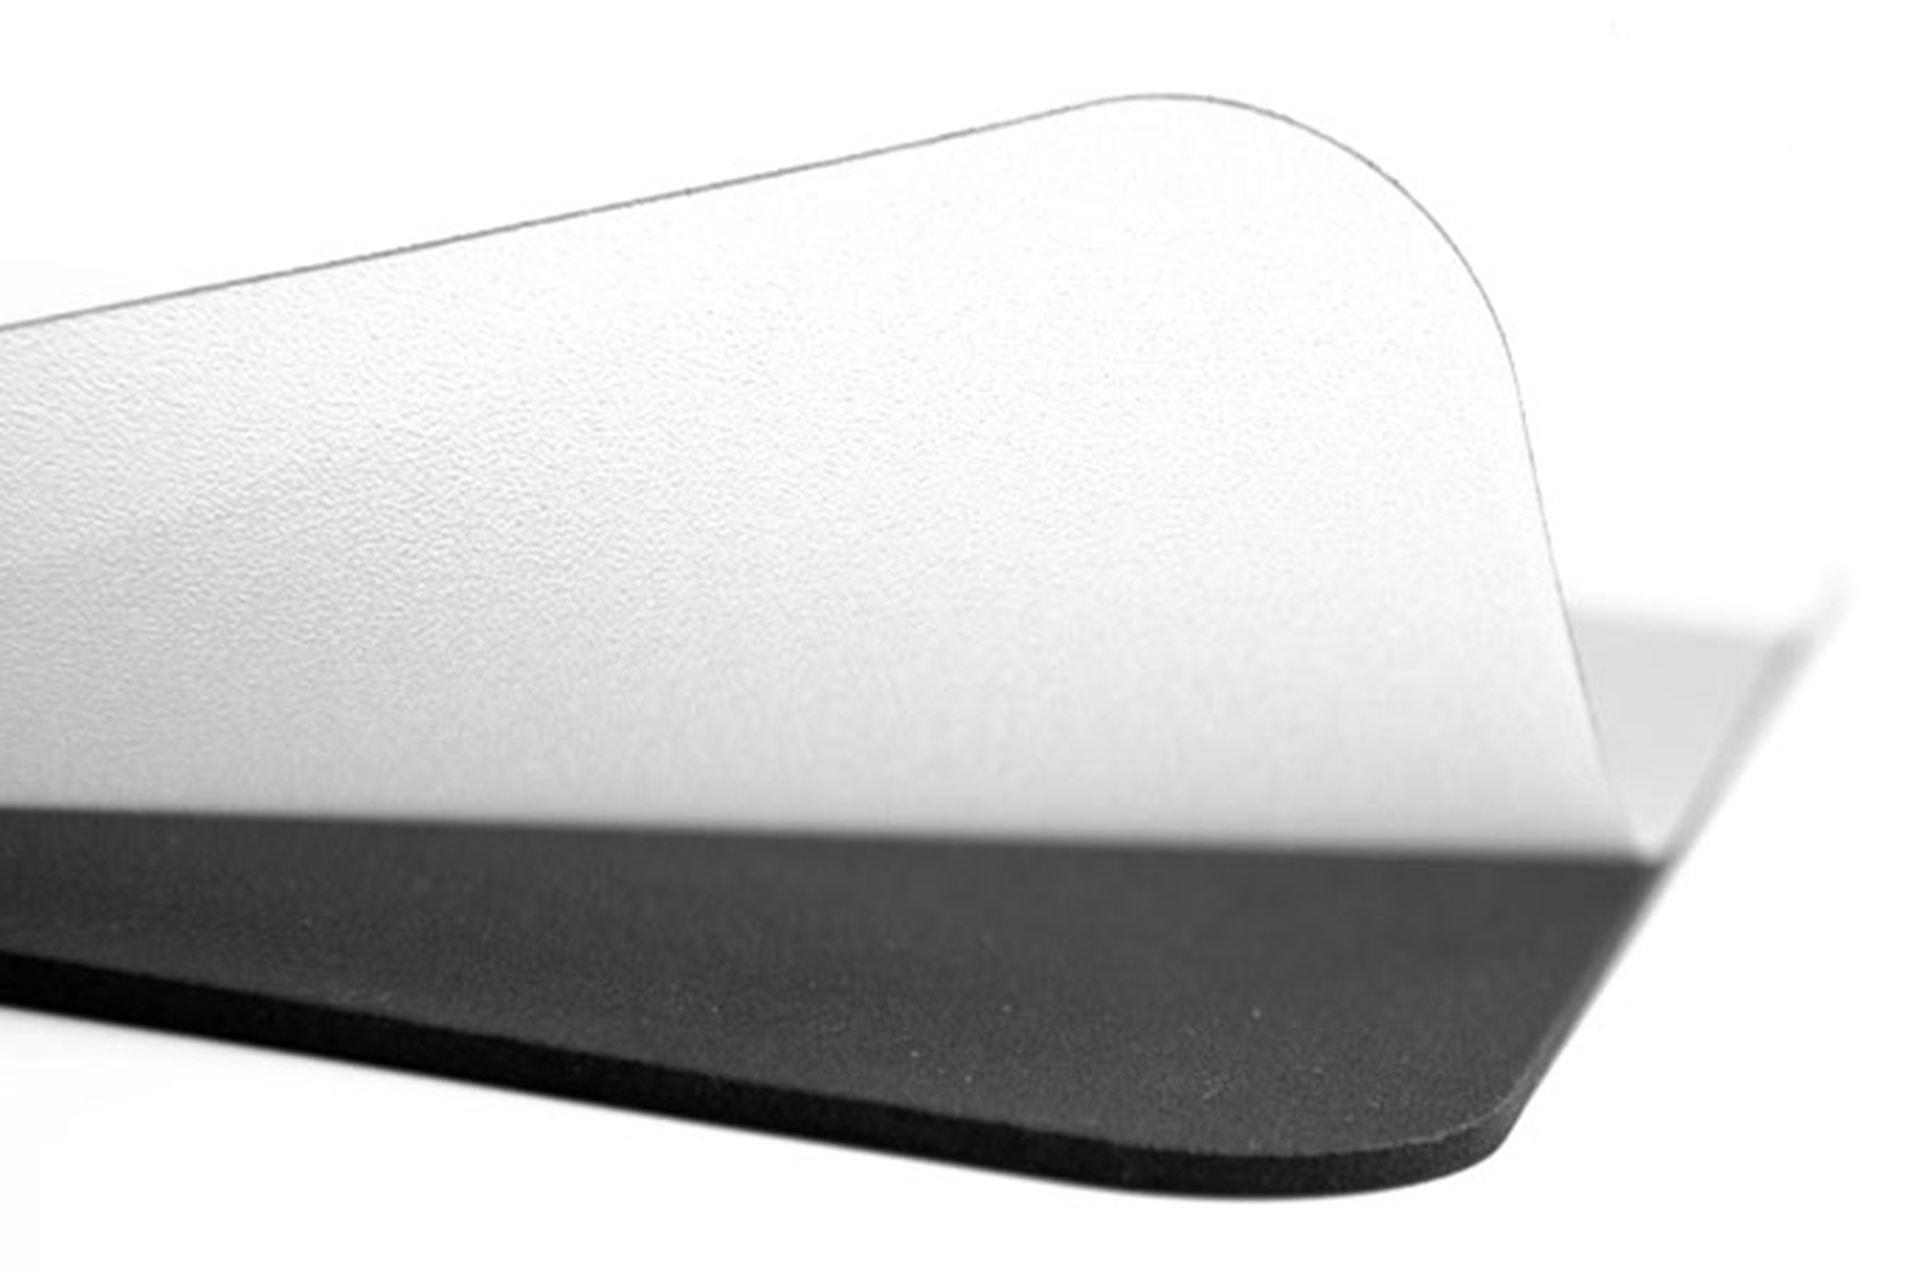 Mouse pad portadocumenti tasca inserimento notes